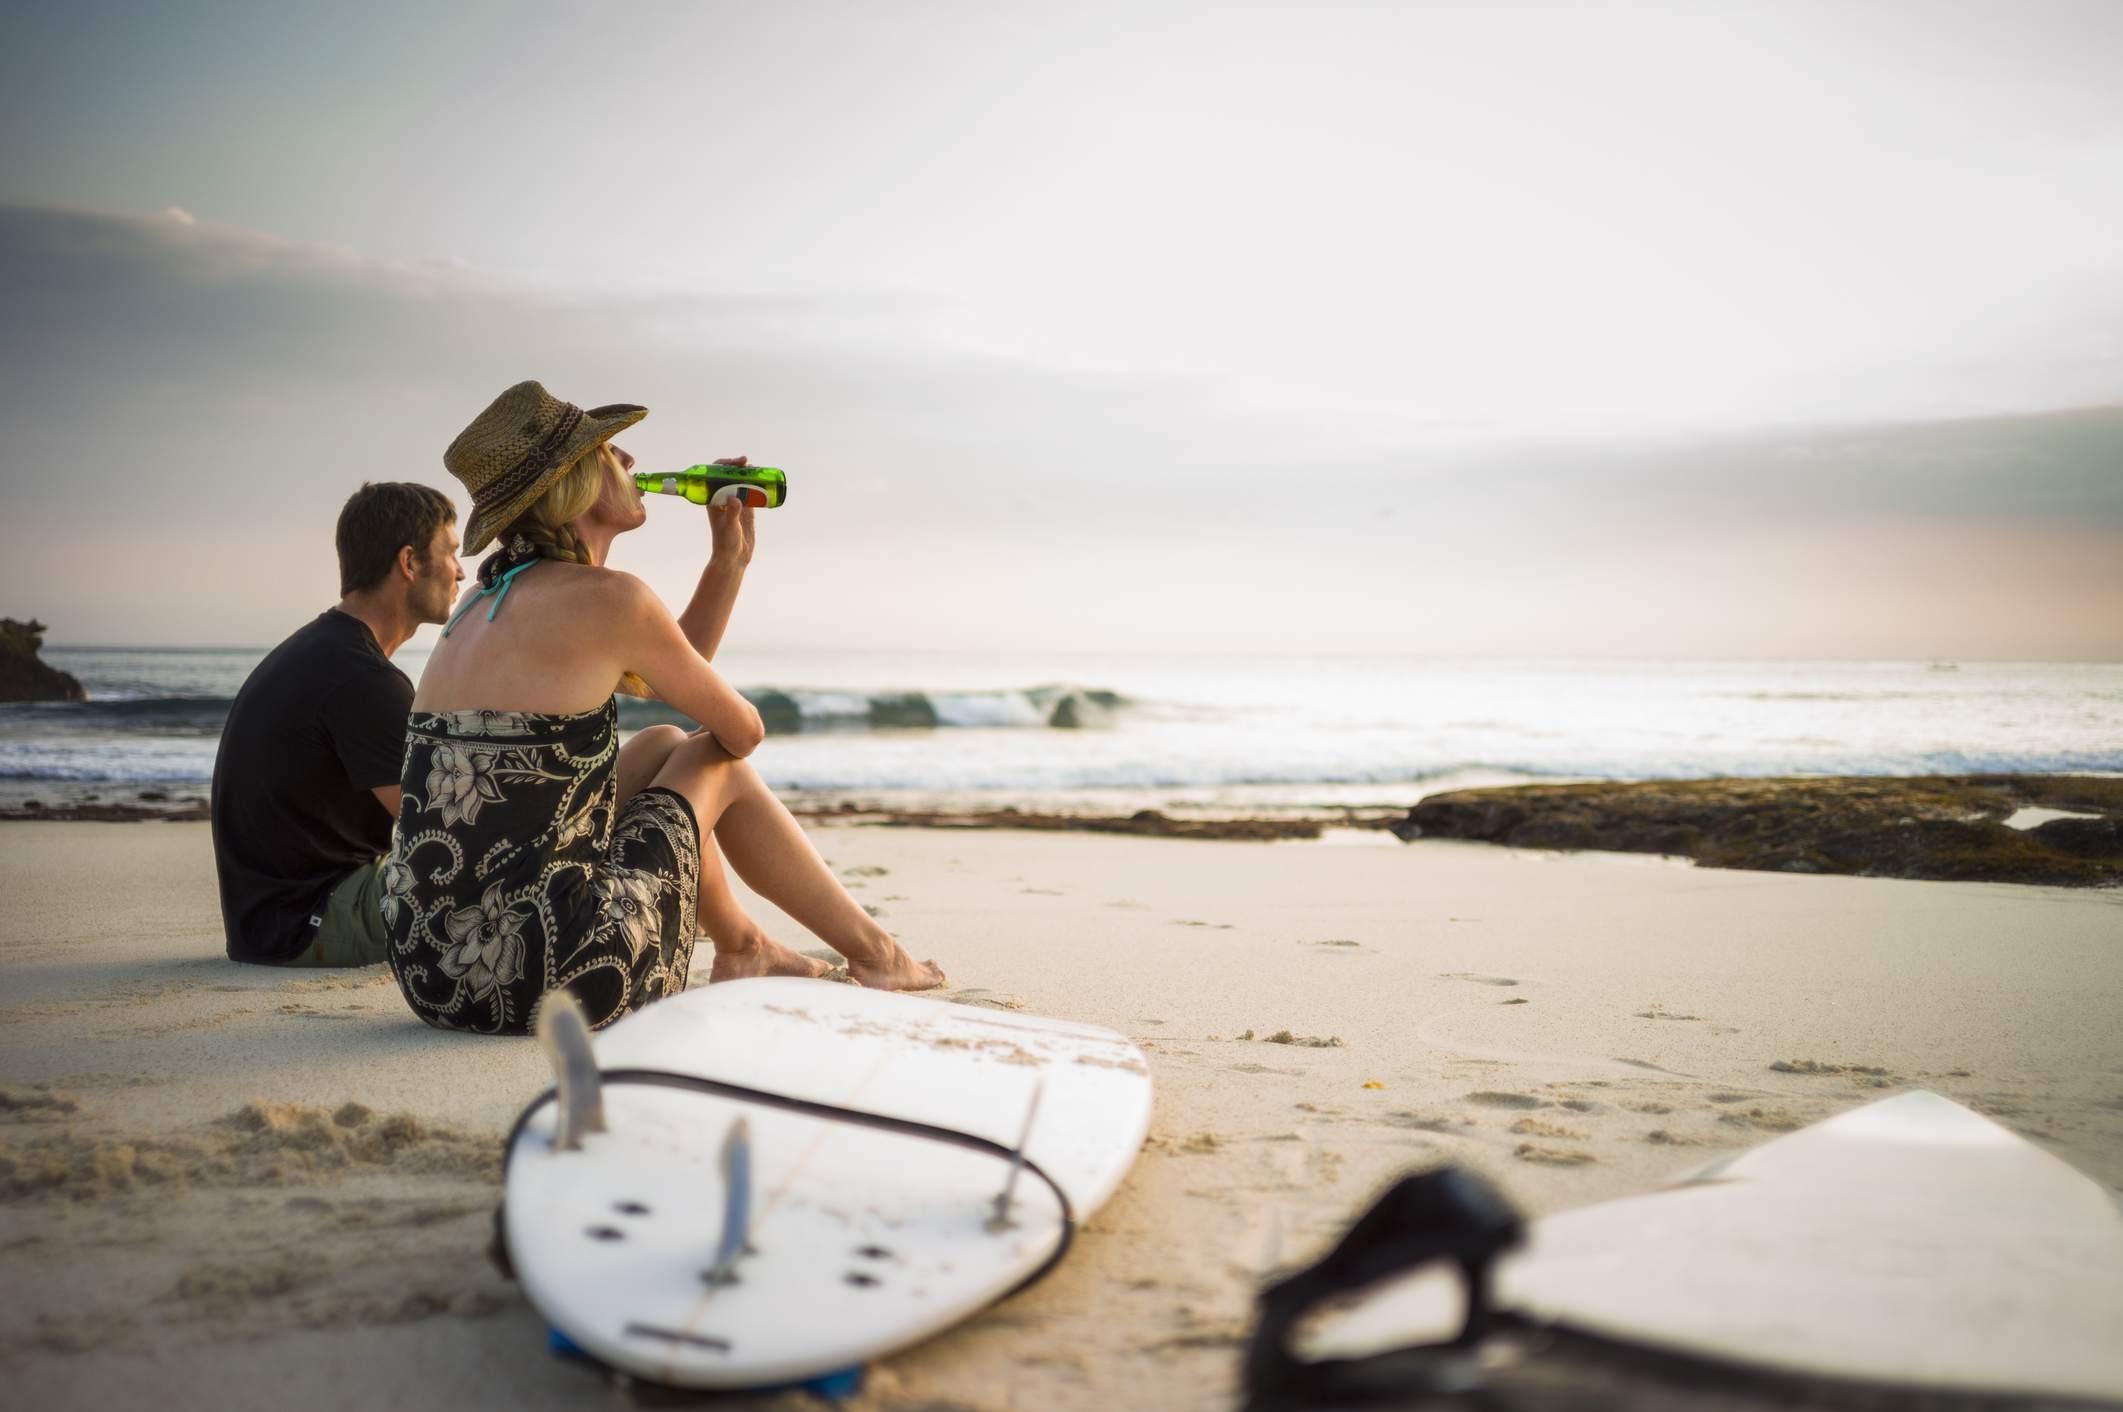 Bali beach with surfboard